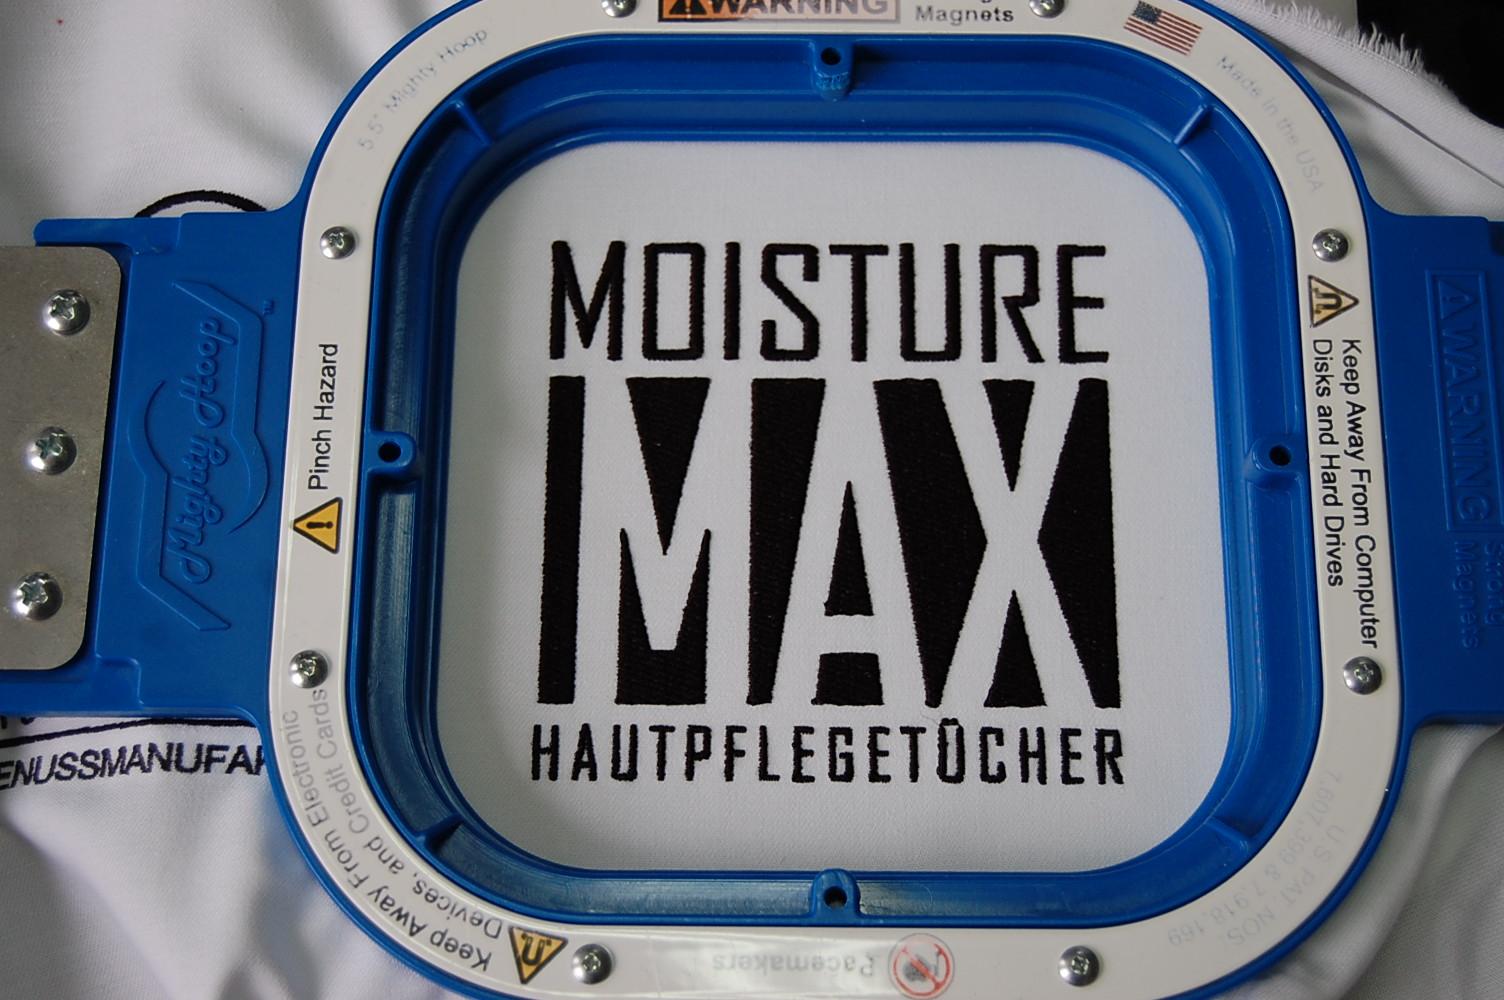 Moisture Max, Logostick